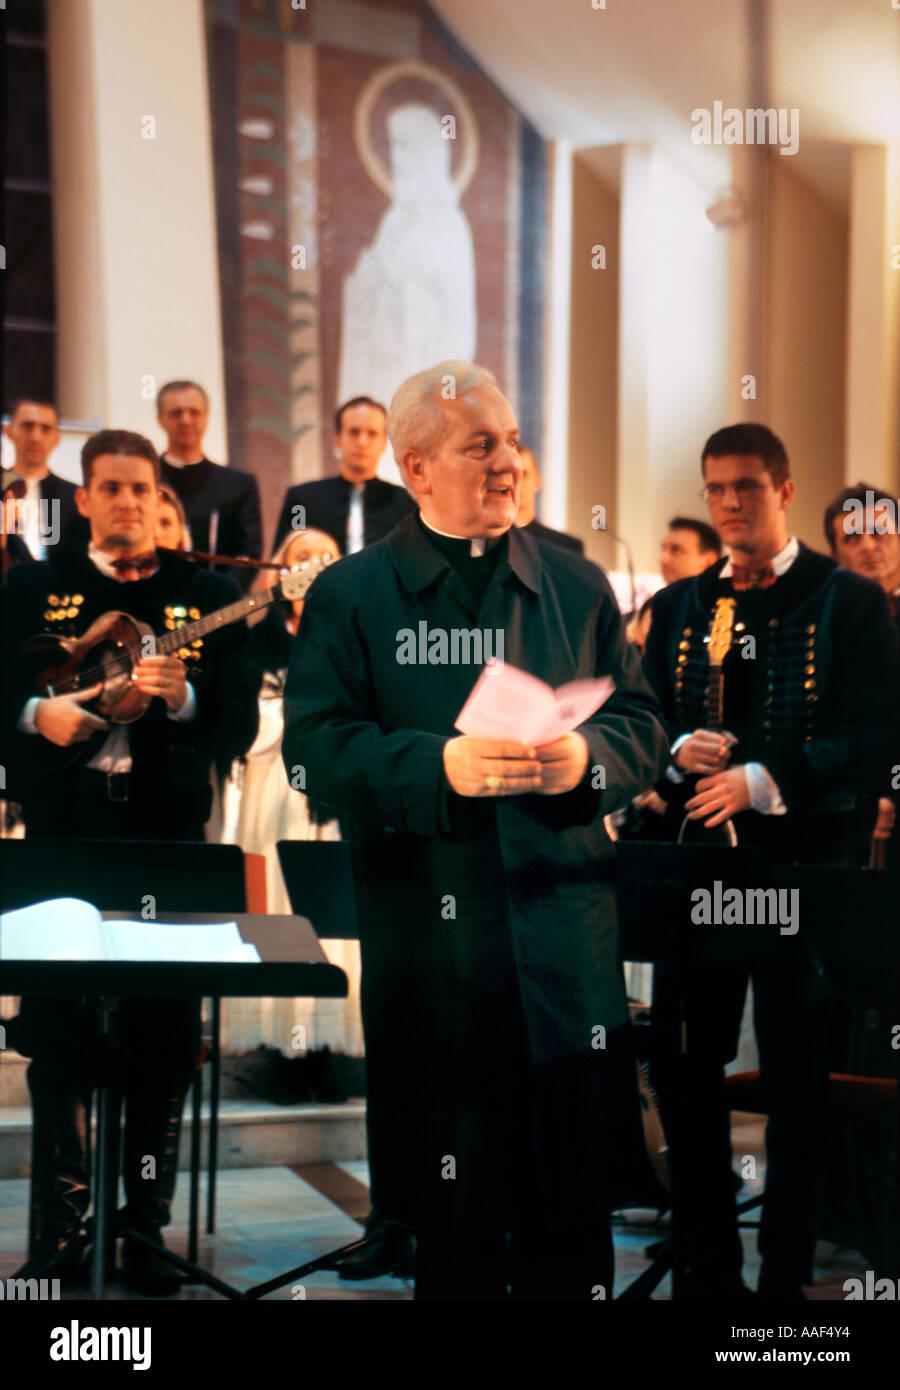 Nobel Peace Prize Nominee Bischof Franjo Komarica von Banja Luka, Bosnien und Herzegowina am Weihnachtskonzert Dezember 2005 Banja Luka Stockbild